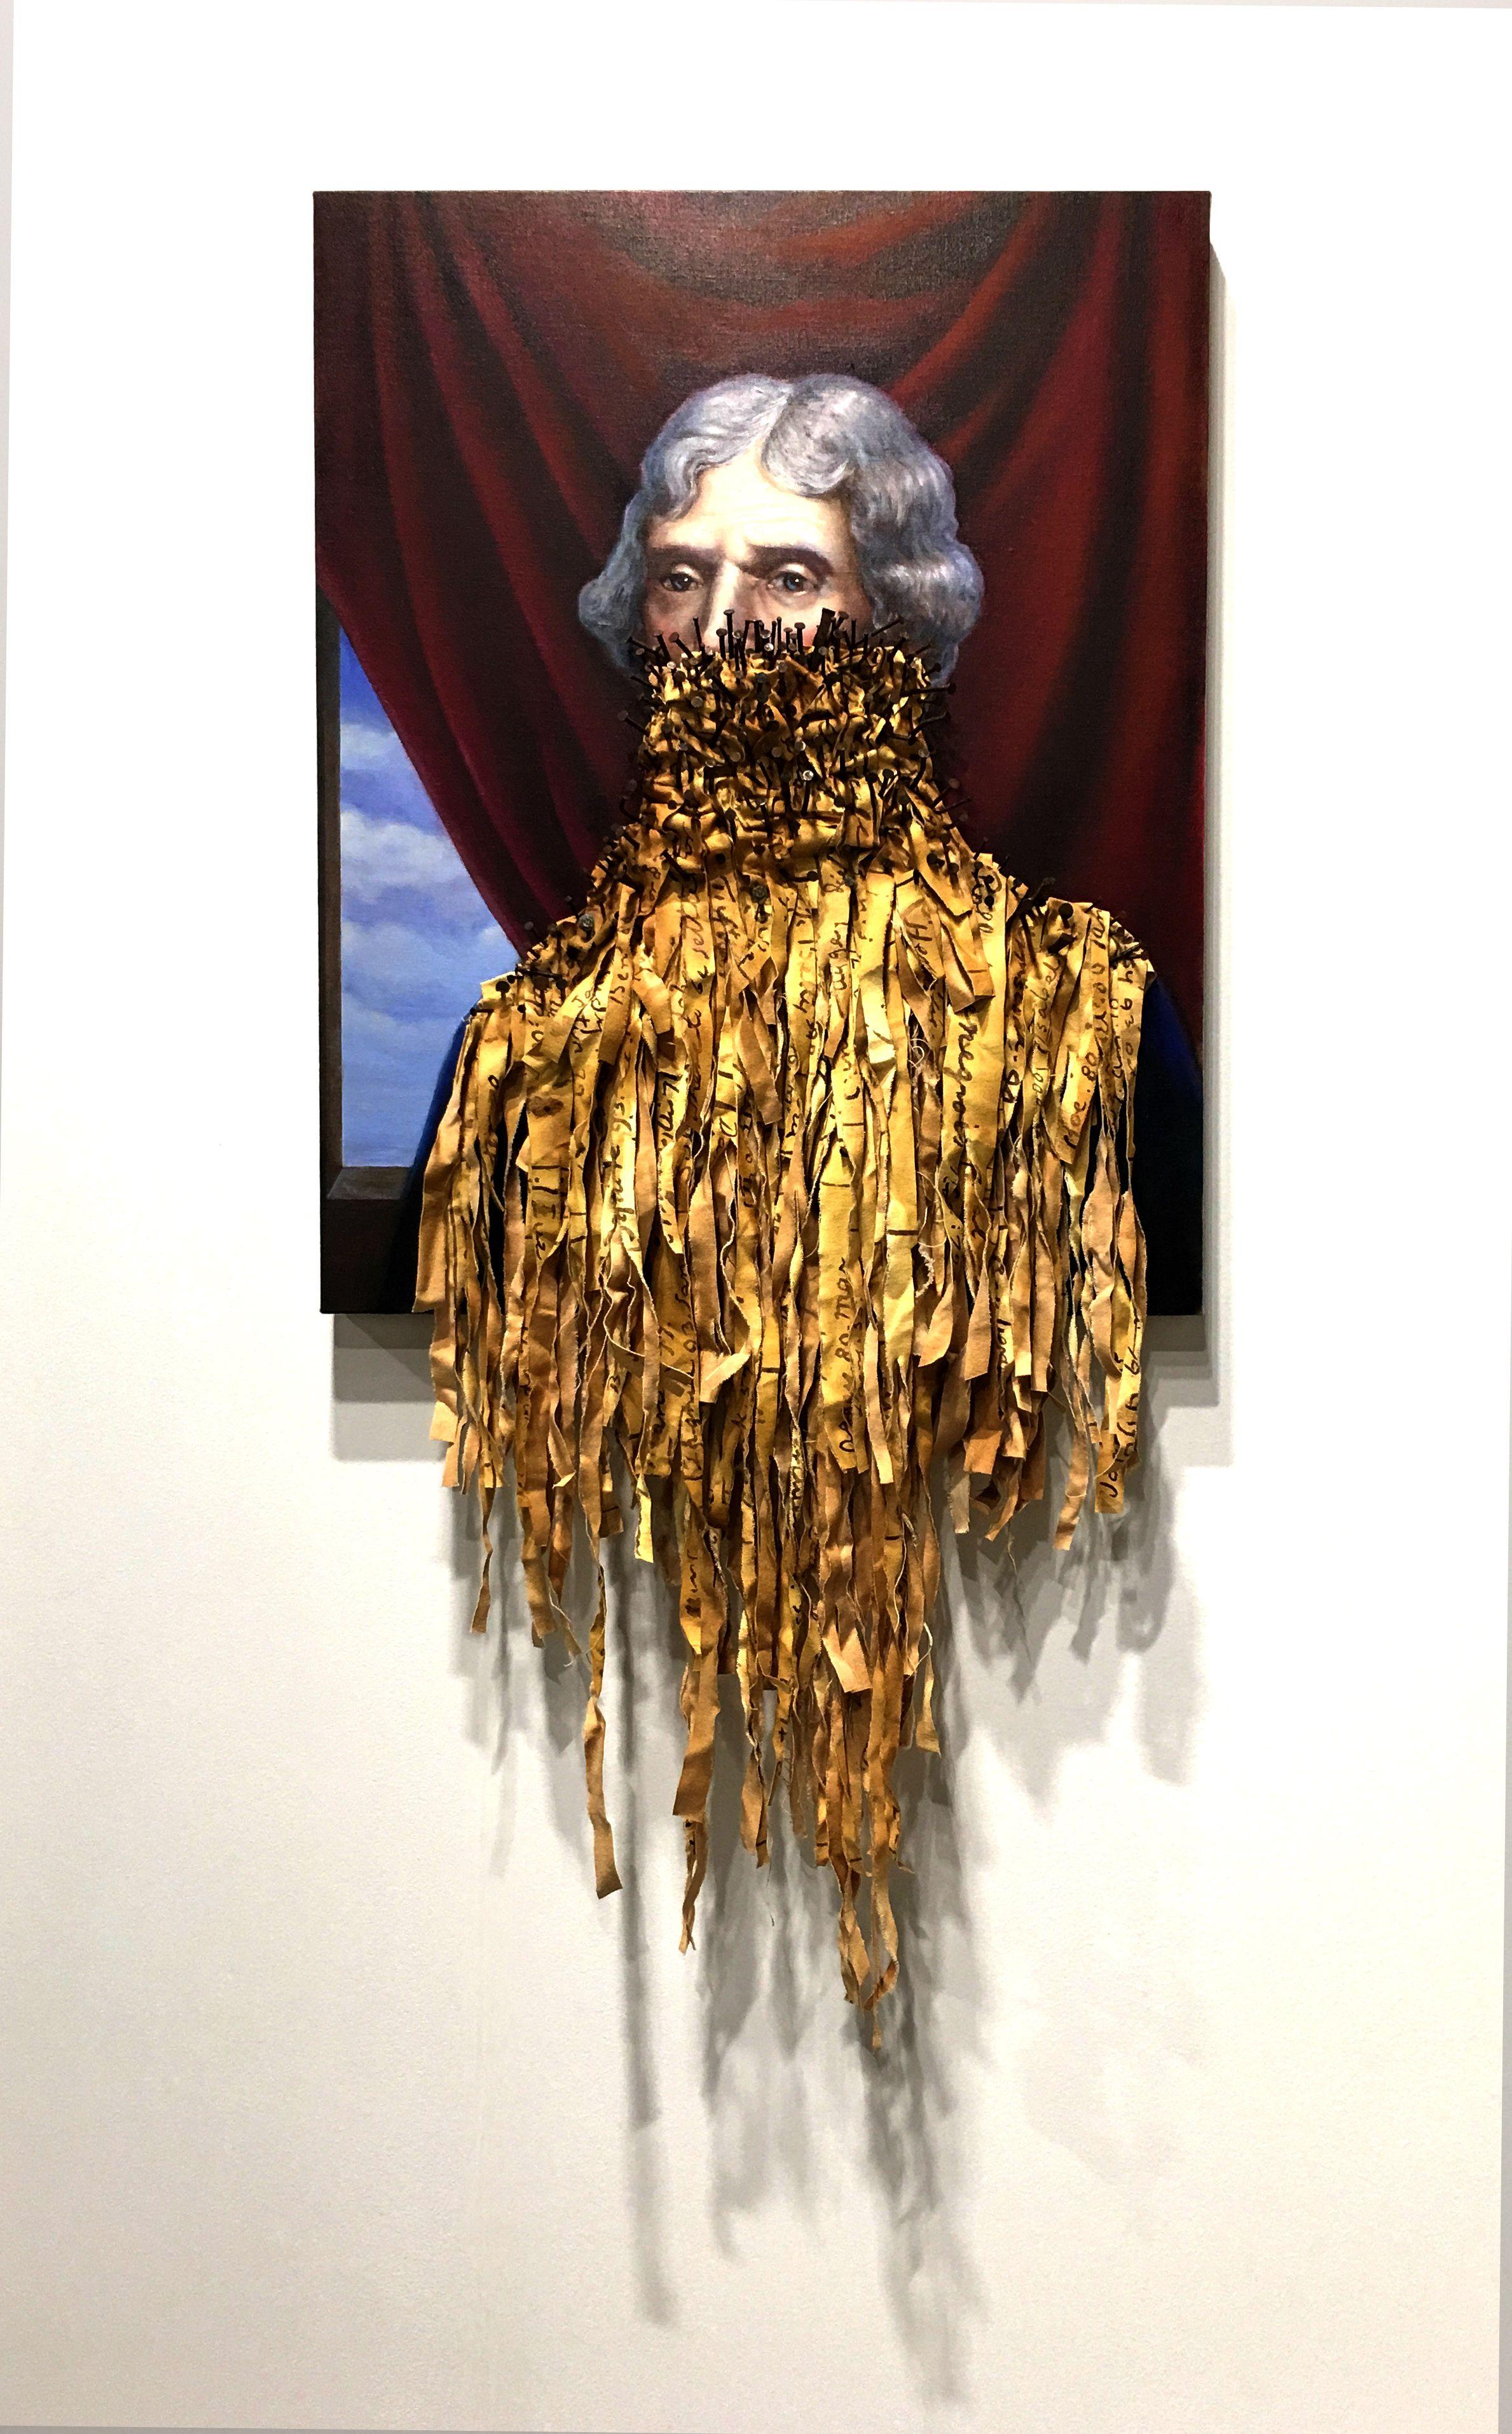 20 Pieces Of Trump Protest Art From Art Basel Miami Beach Protest Art Art Popular Art